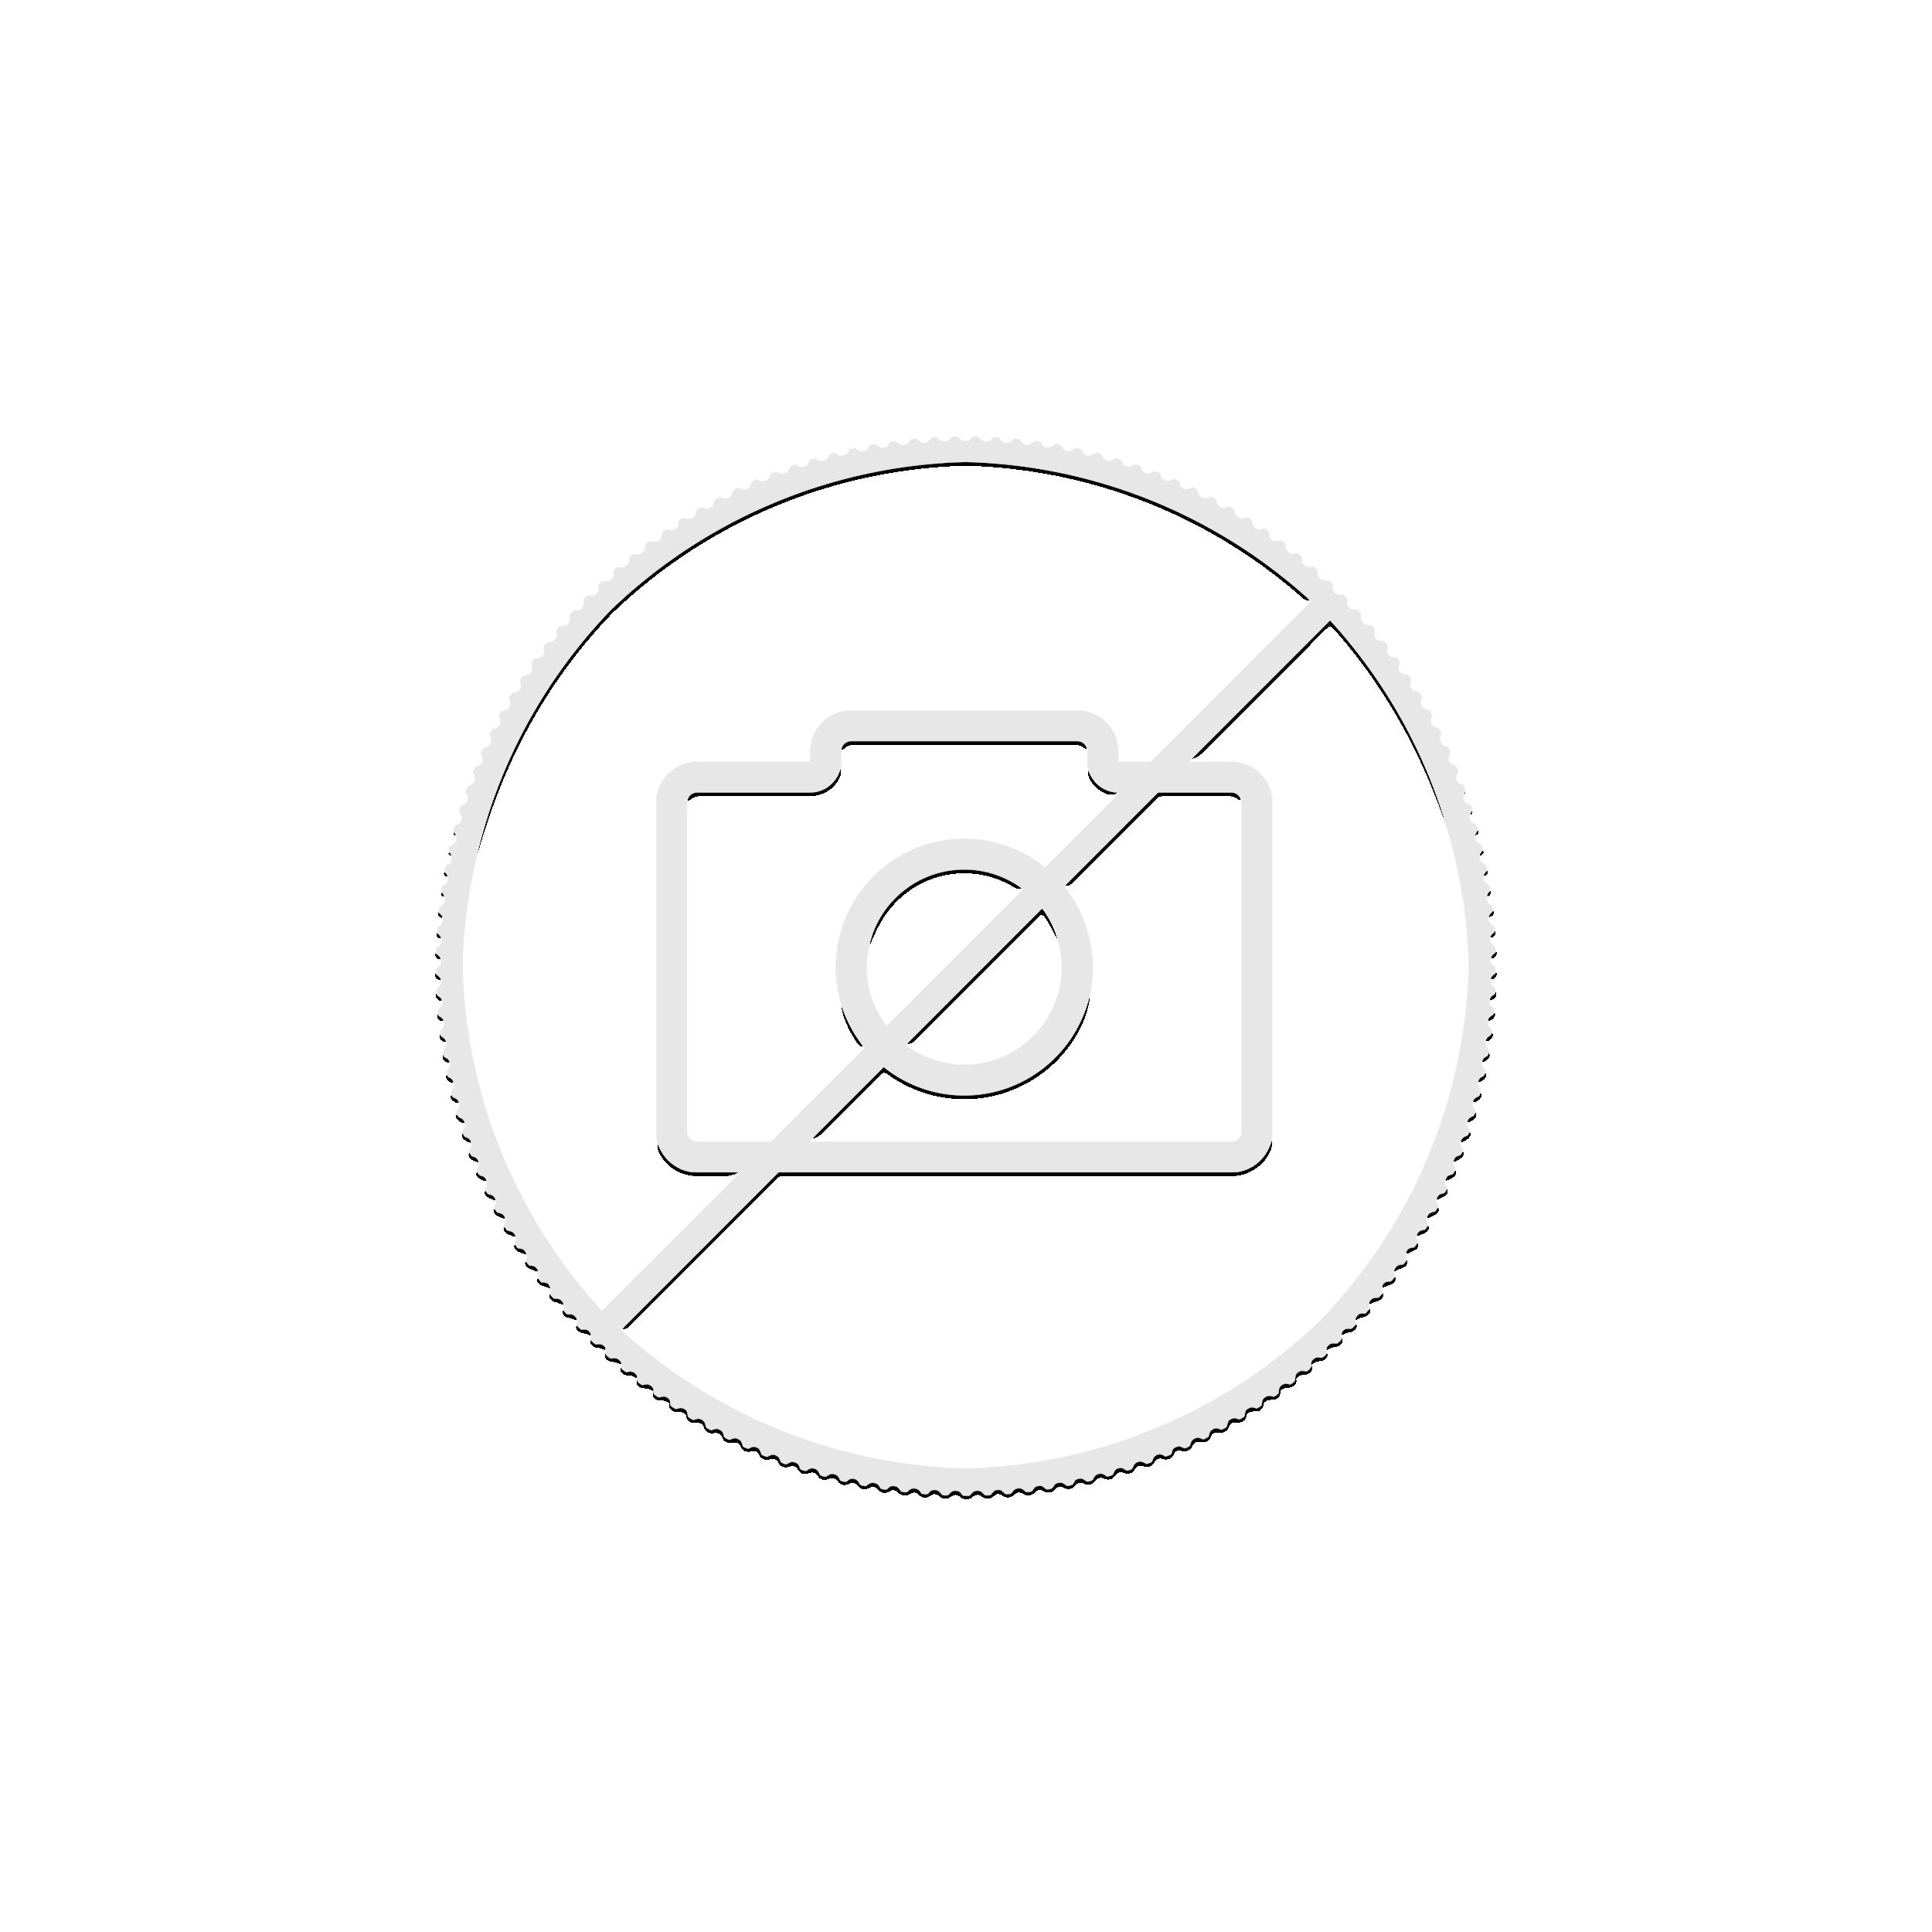 1 troy ounce Silver coin Kookaburra 2016 obverse